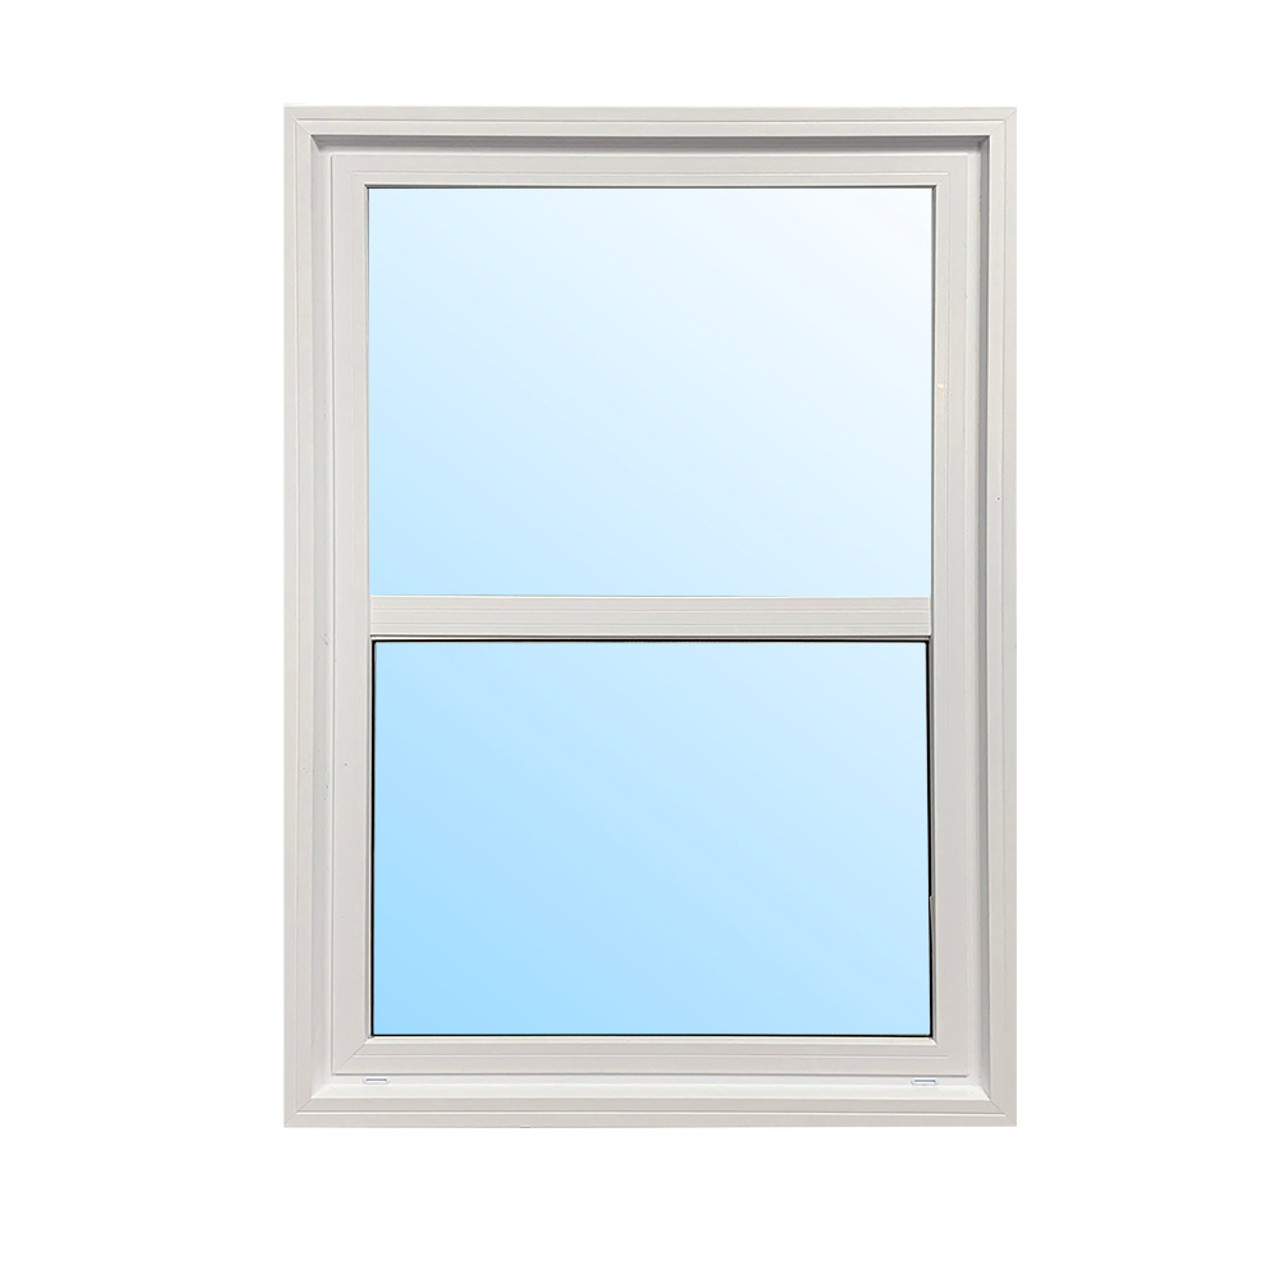 "Castlegard | 36"" x 48"" Single Hung Window | LEA"